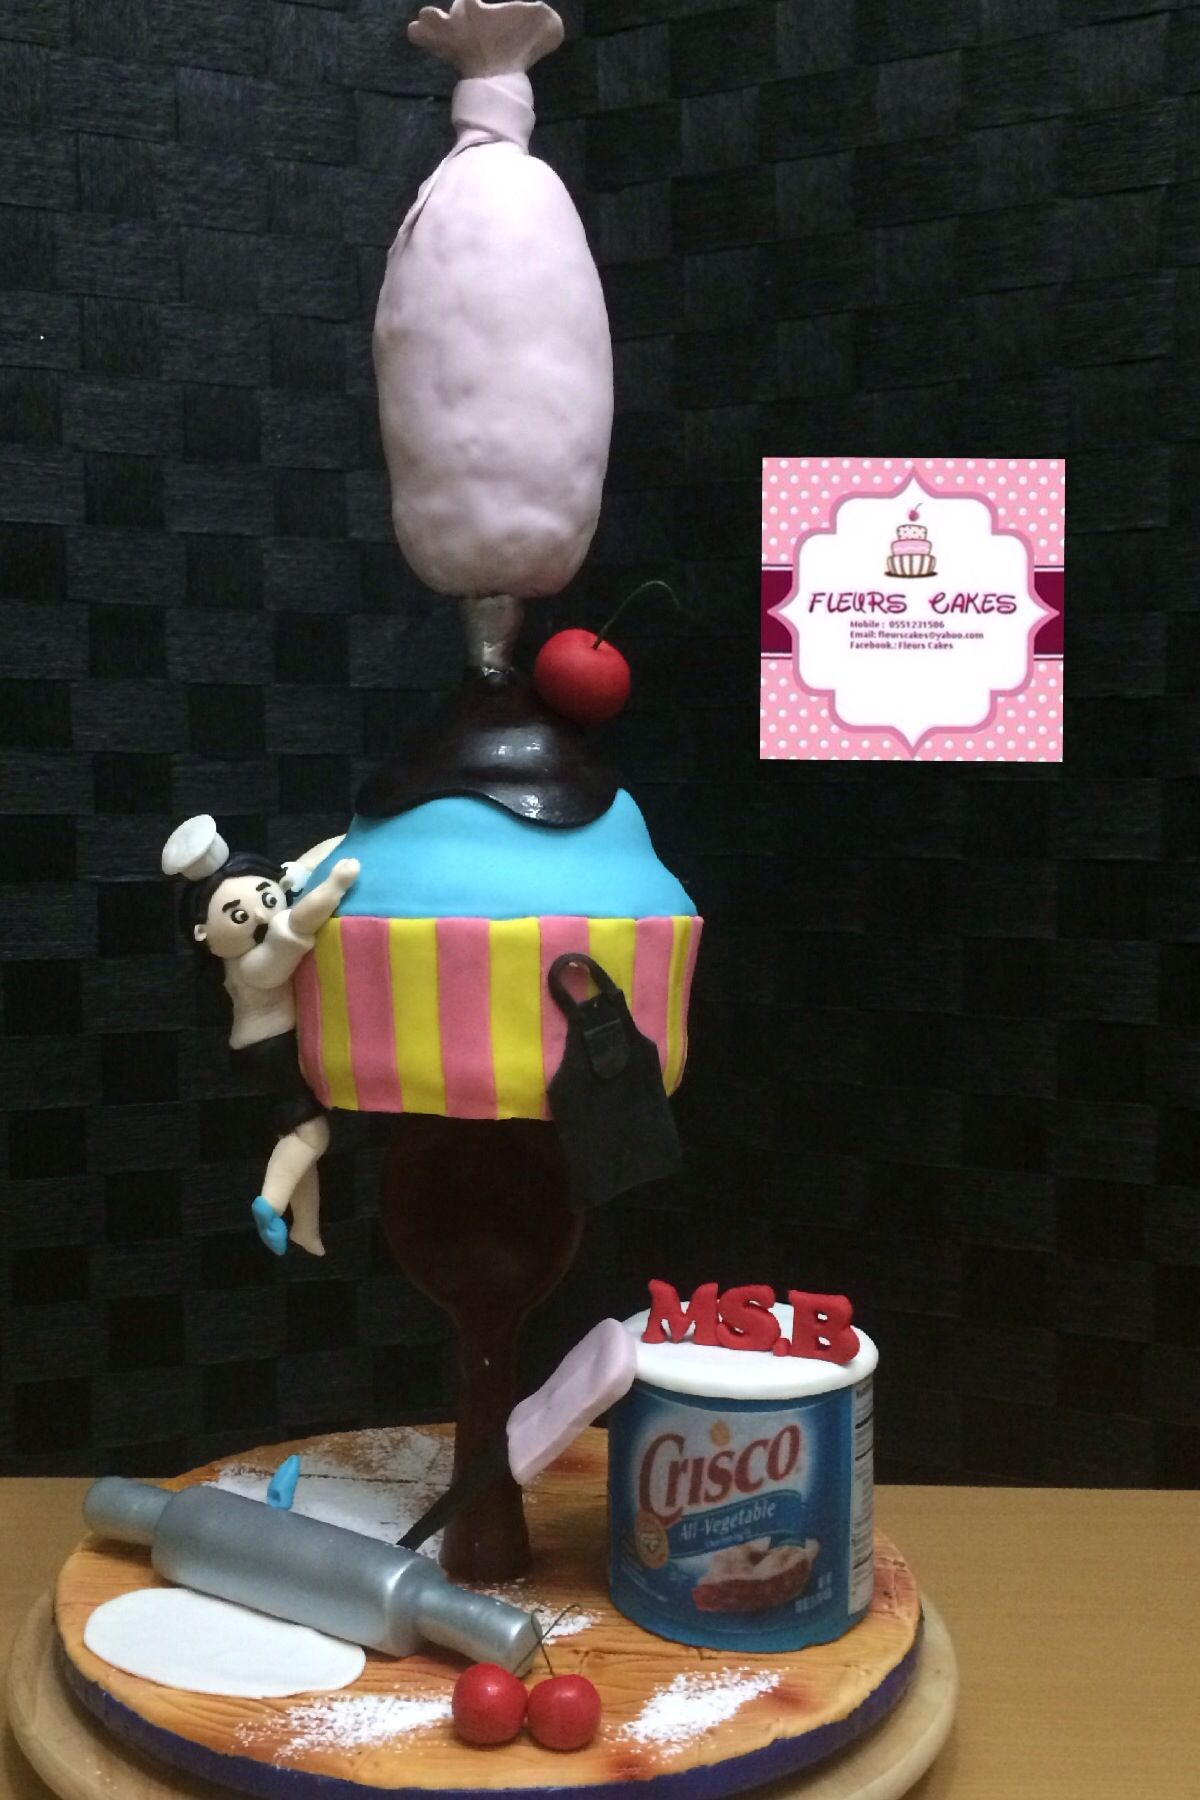 Gravity defying cake